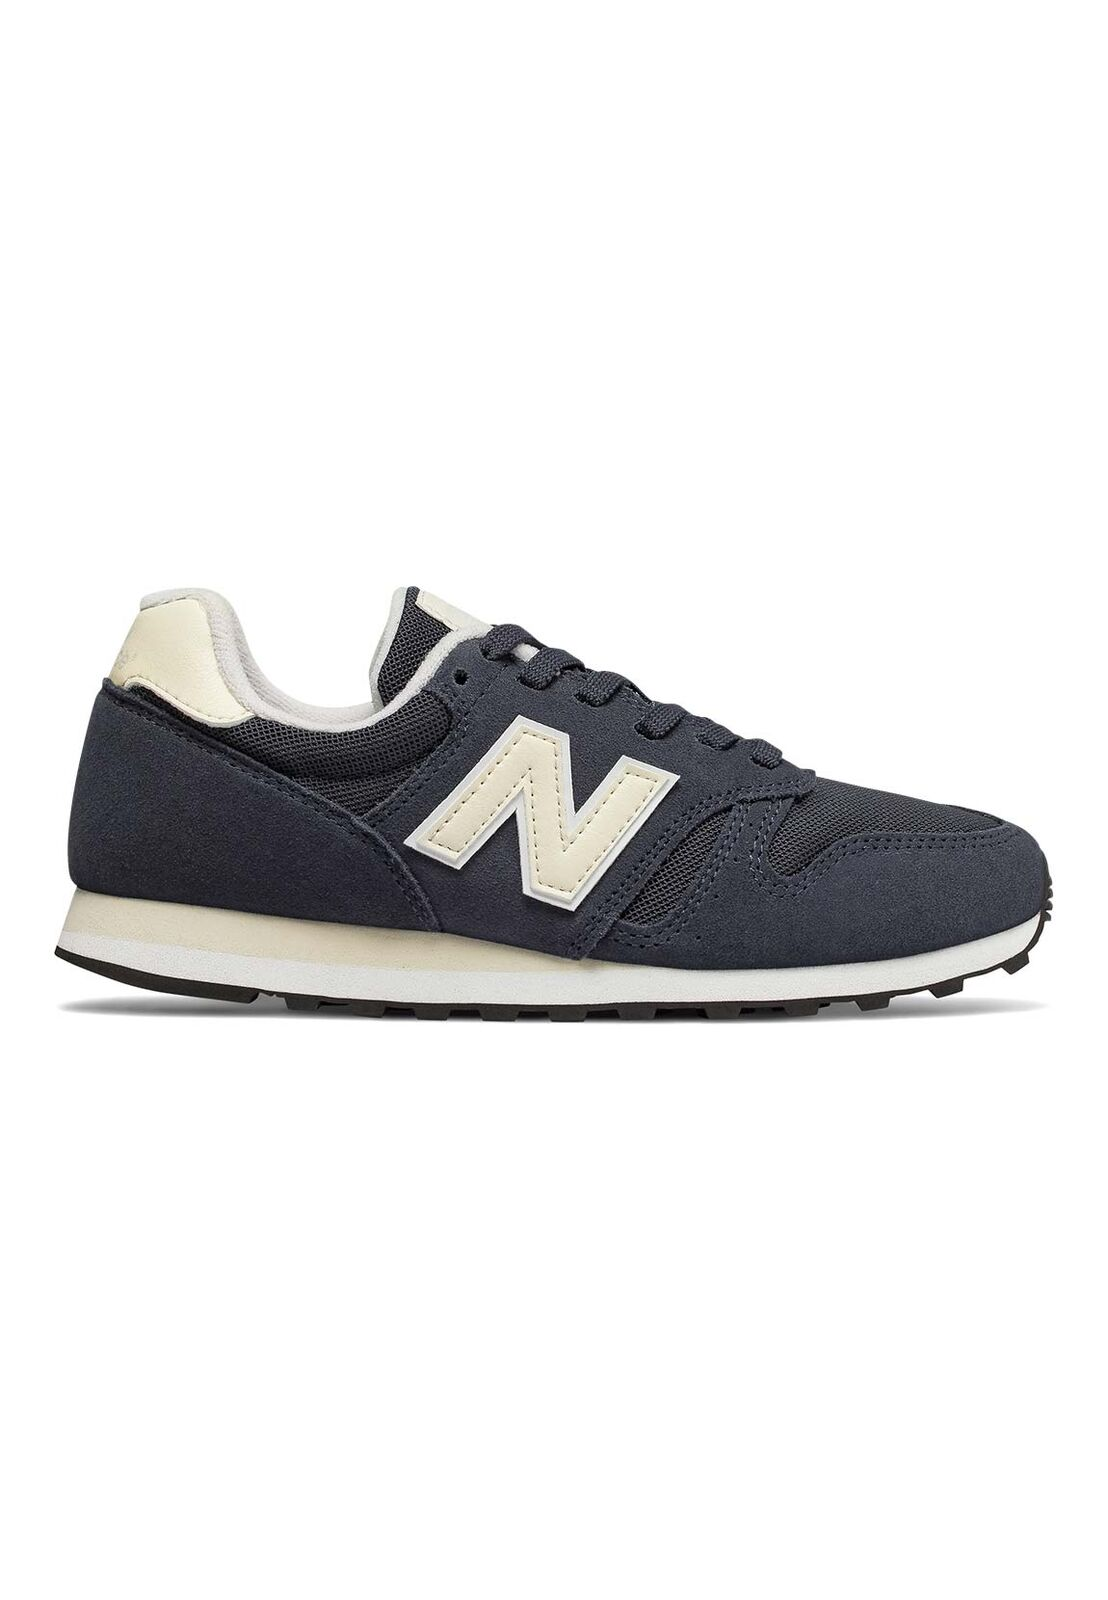 New Balance Balance Balance Sneaker Women's WL373NVB Dark bluee Navy 6c258b